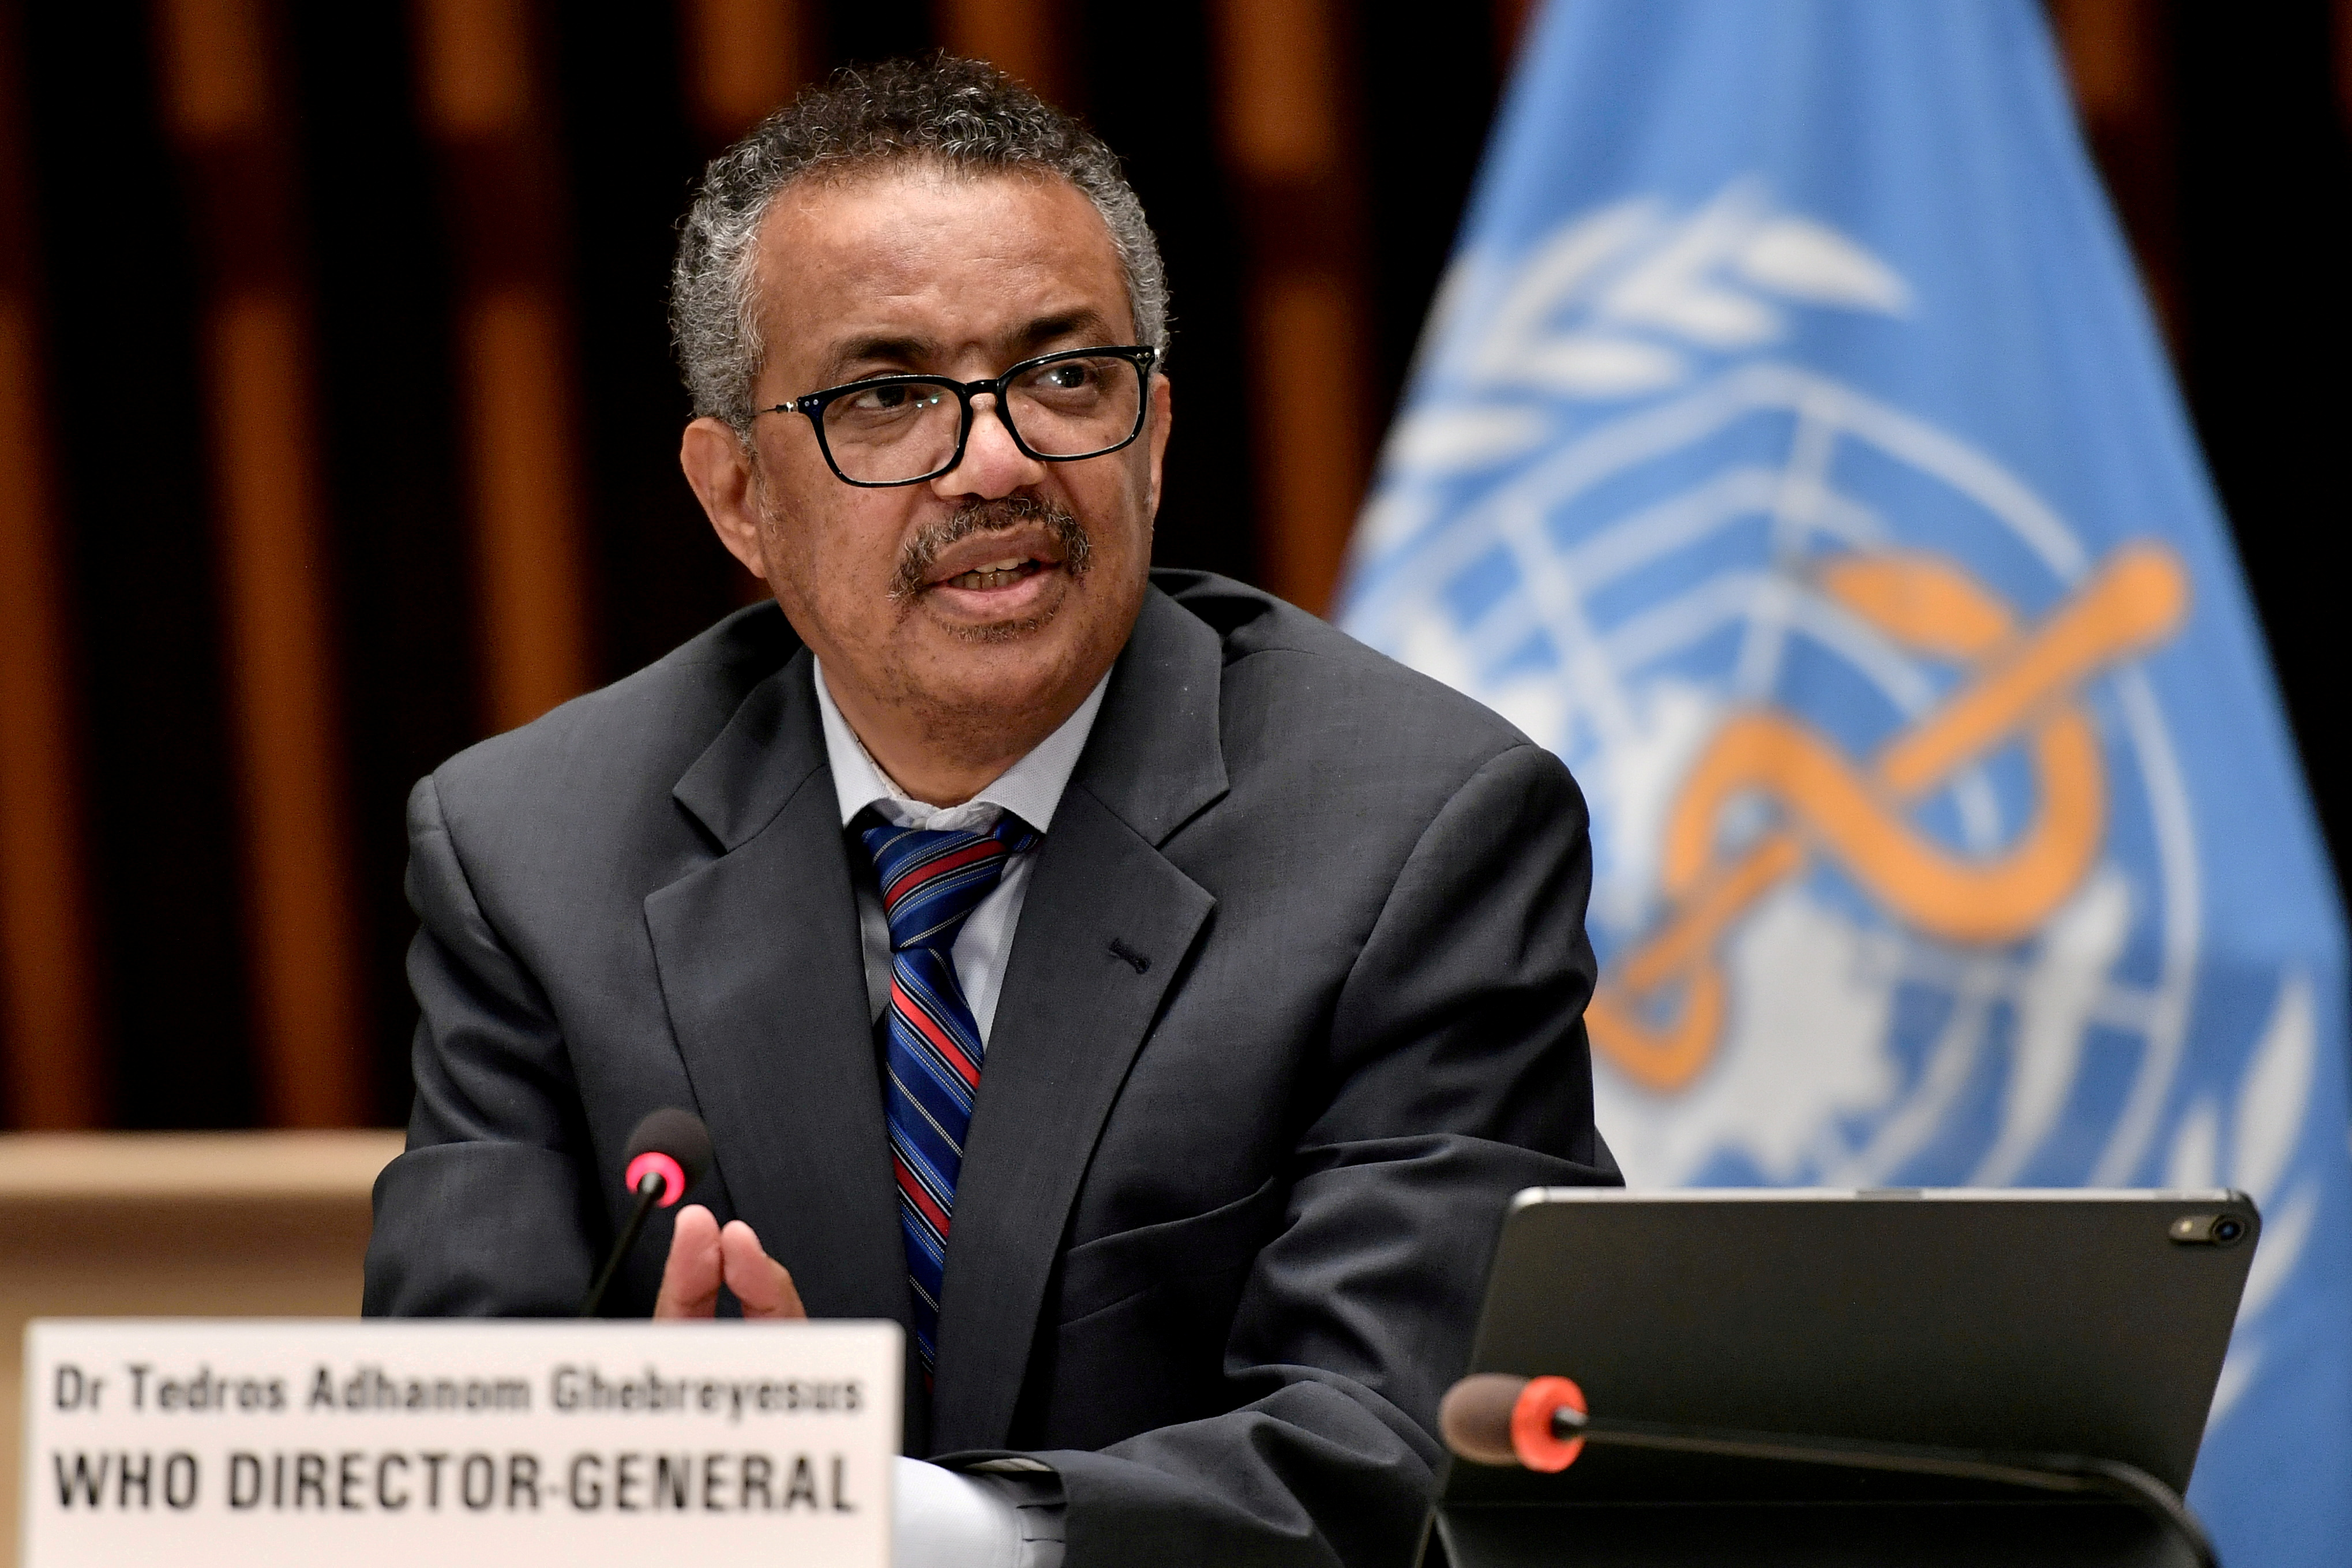 World Health Organization (WHO) Director-General Tedros Adhanom Ghebreyesus attends a news conference in Geneva Switzerland July 3, 2020. Fabrice Coffrini/Pool via REUTERS